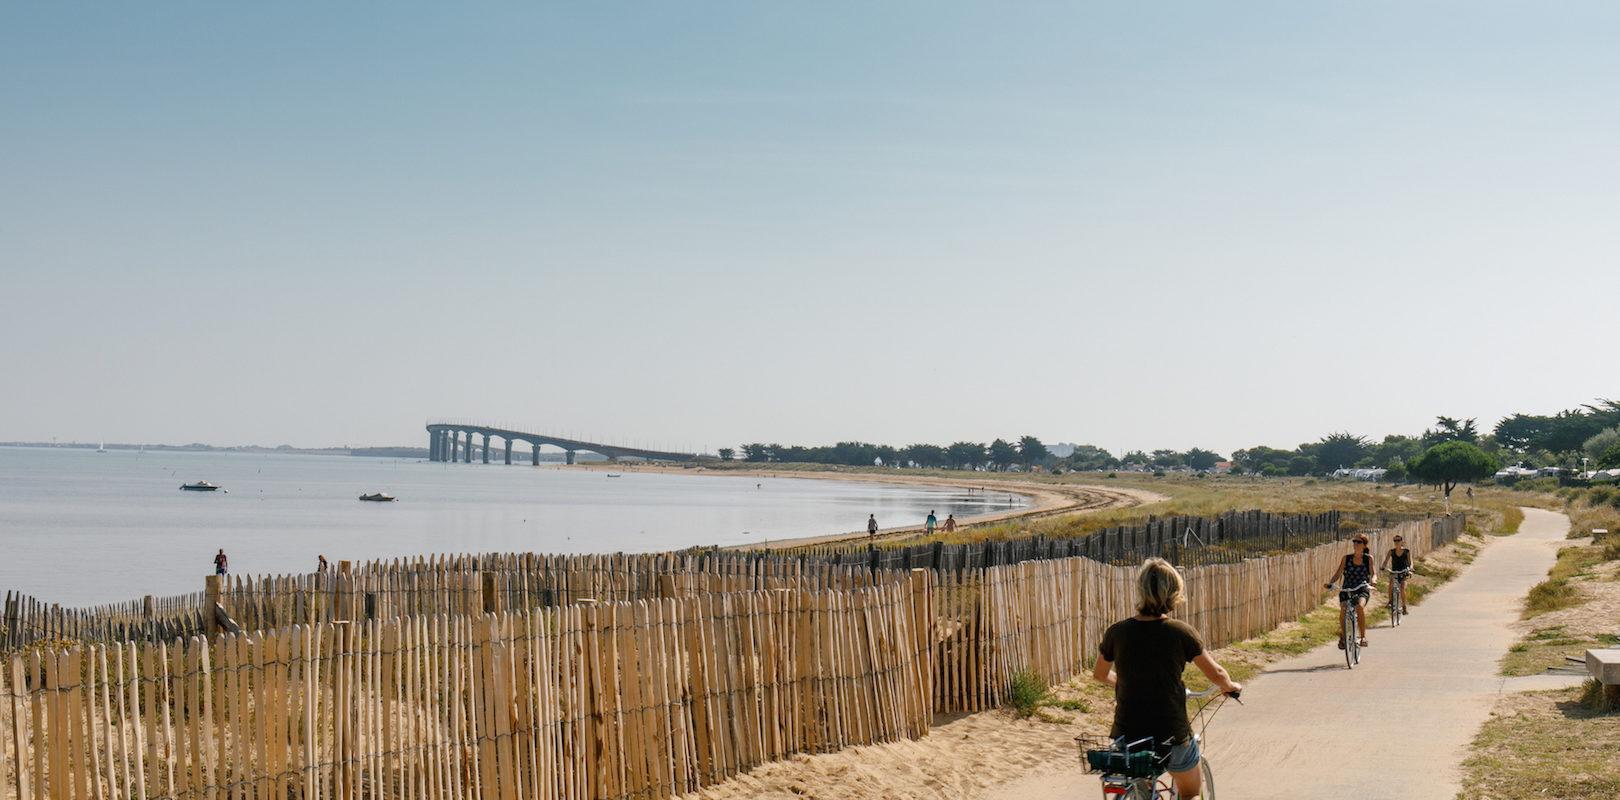 Rivedoux-plage